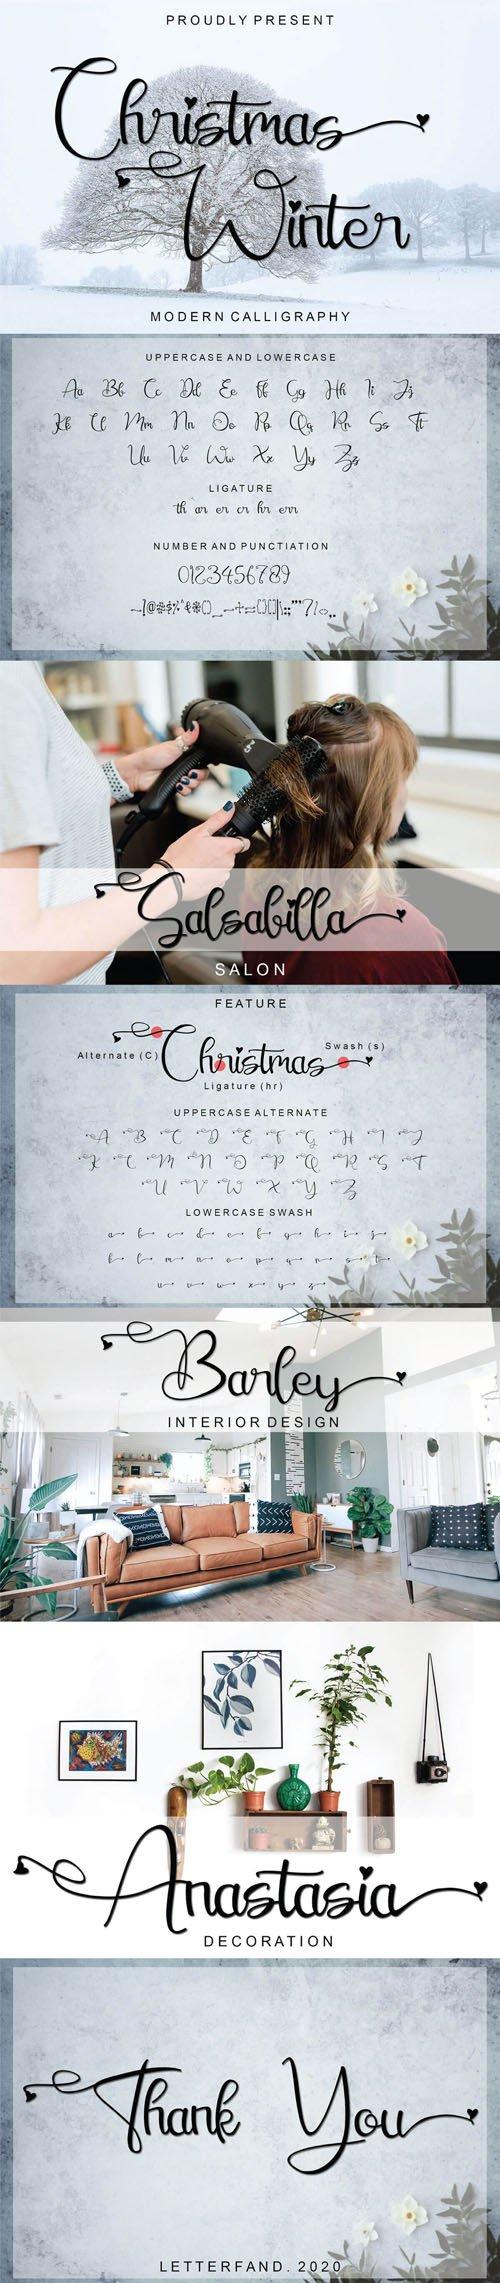 Christmas Winter - Modern Calligraphy Font